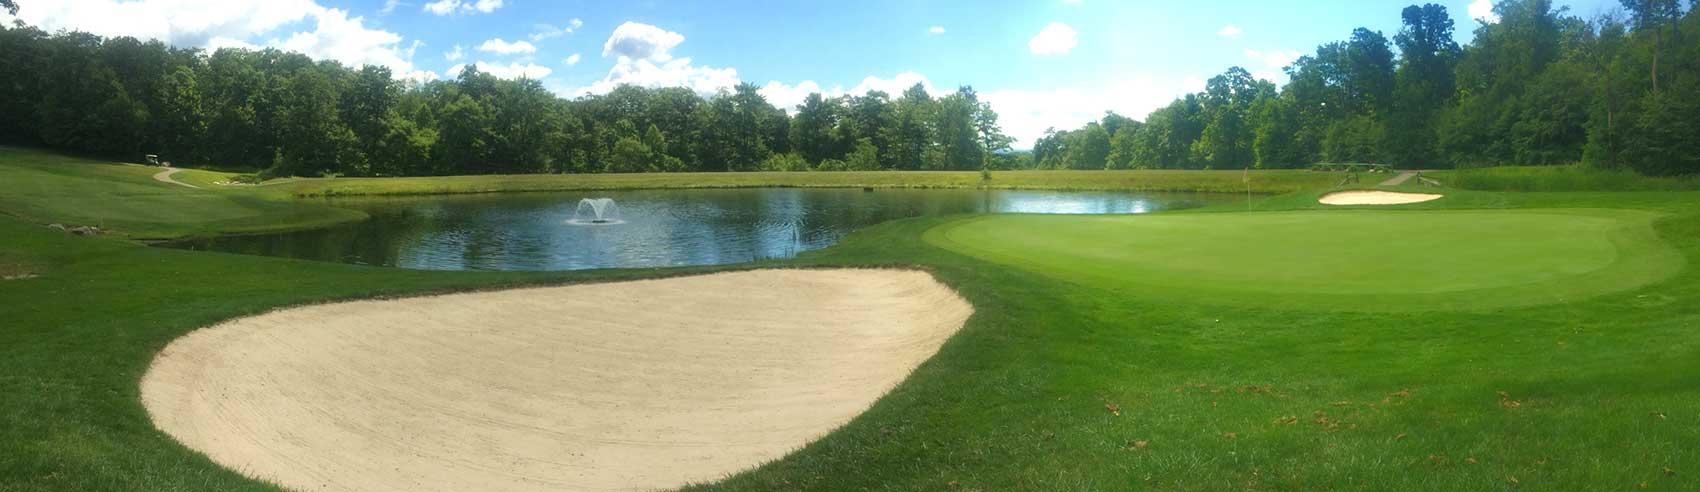 hv-golf-scenic-10